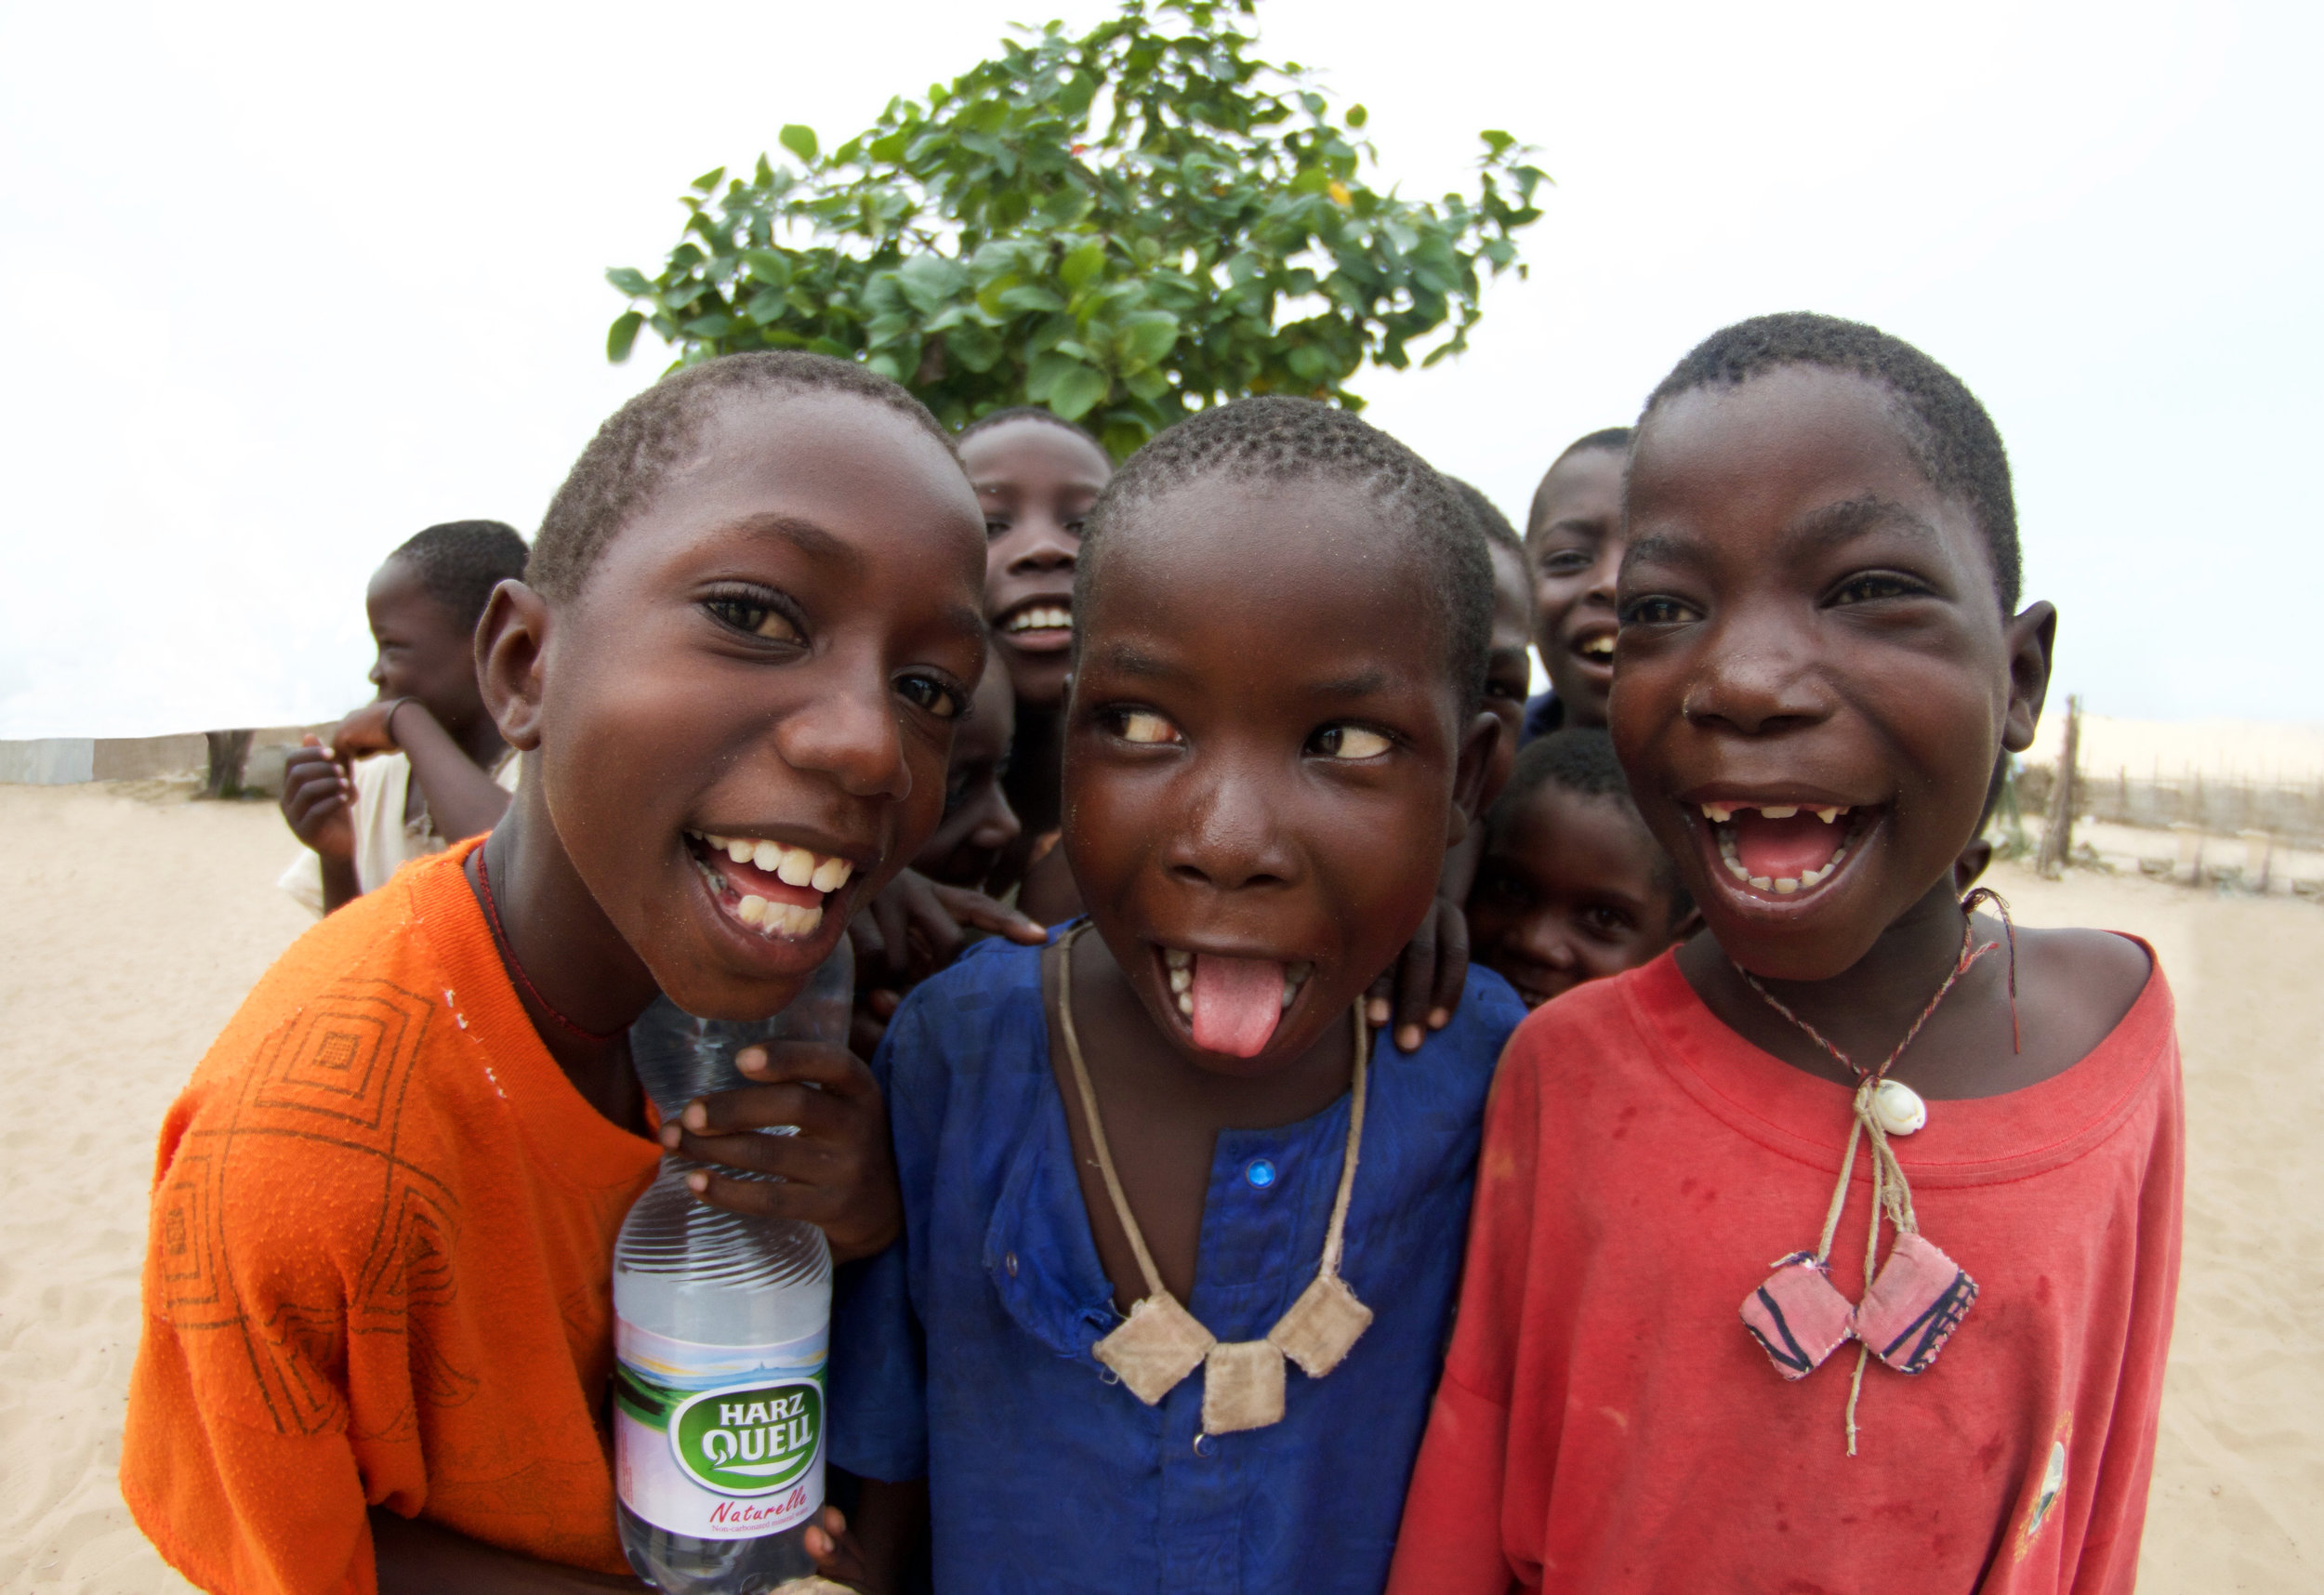 Senegal - Kids Smiling.jpg